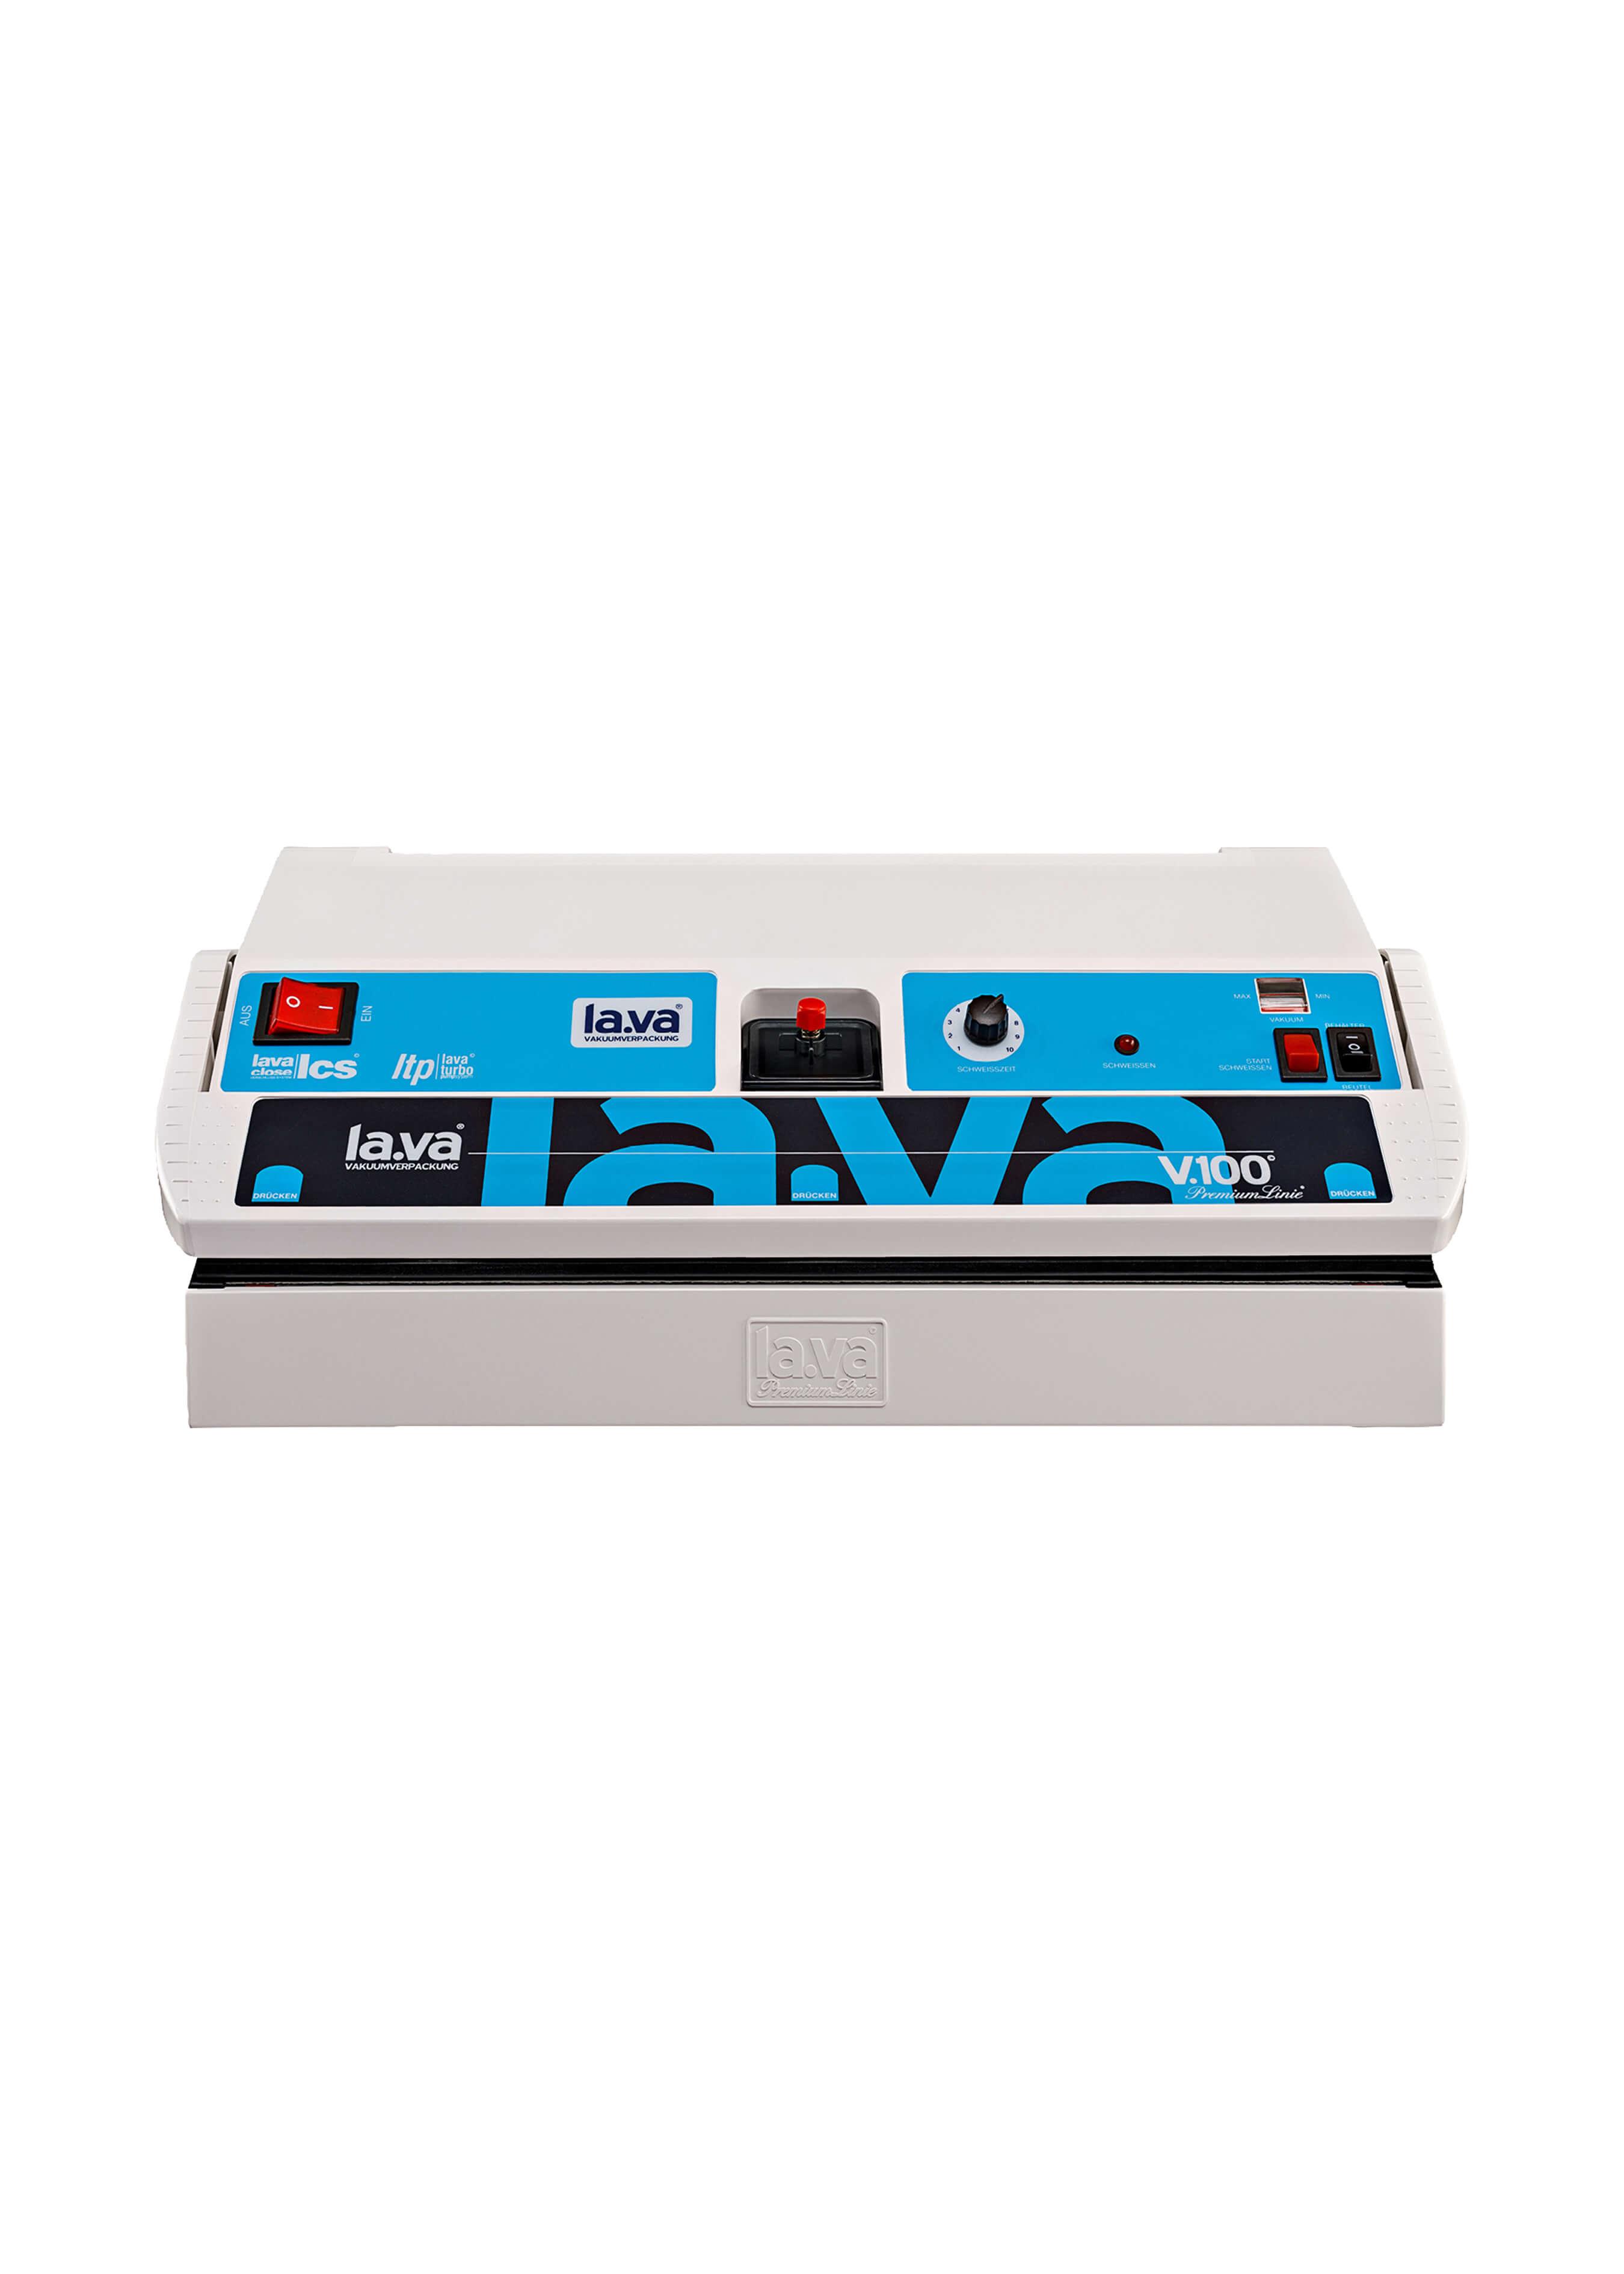 Lava Vakuumiergerät V100 Premium L2194 3